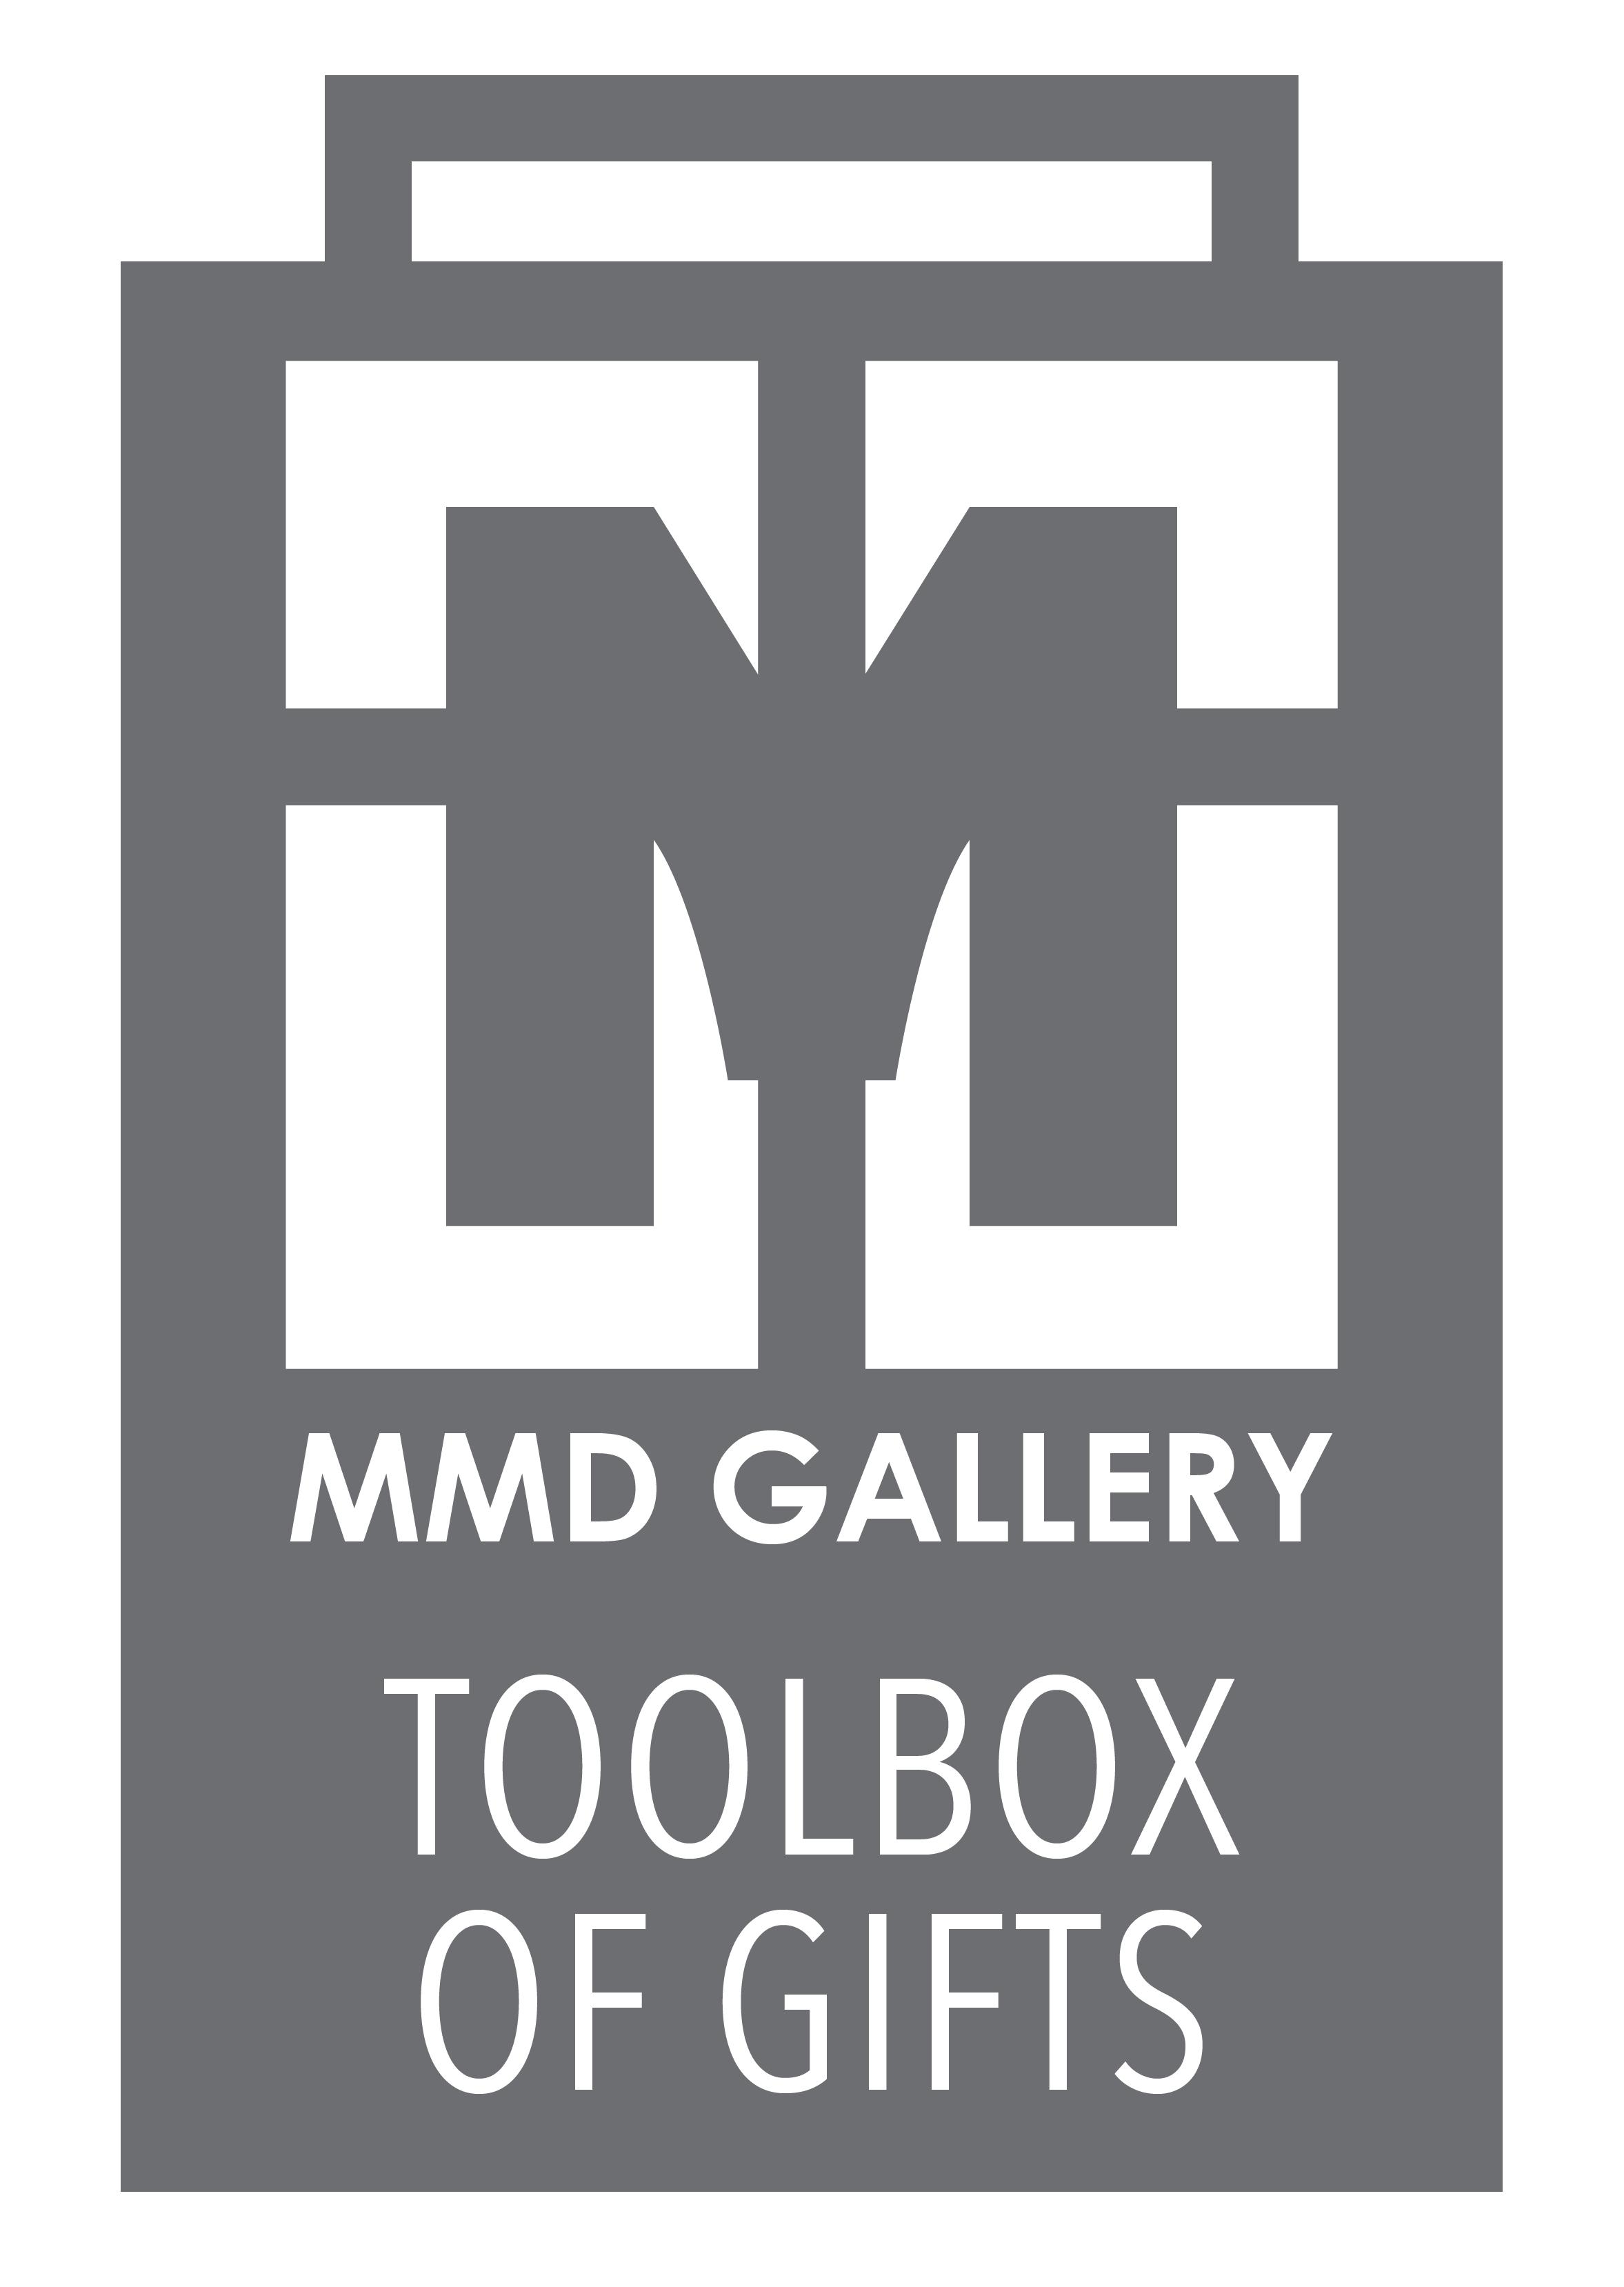 MMDGallery TBOG Logo 1.png